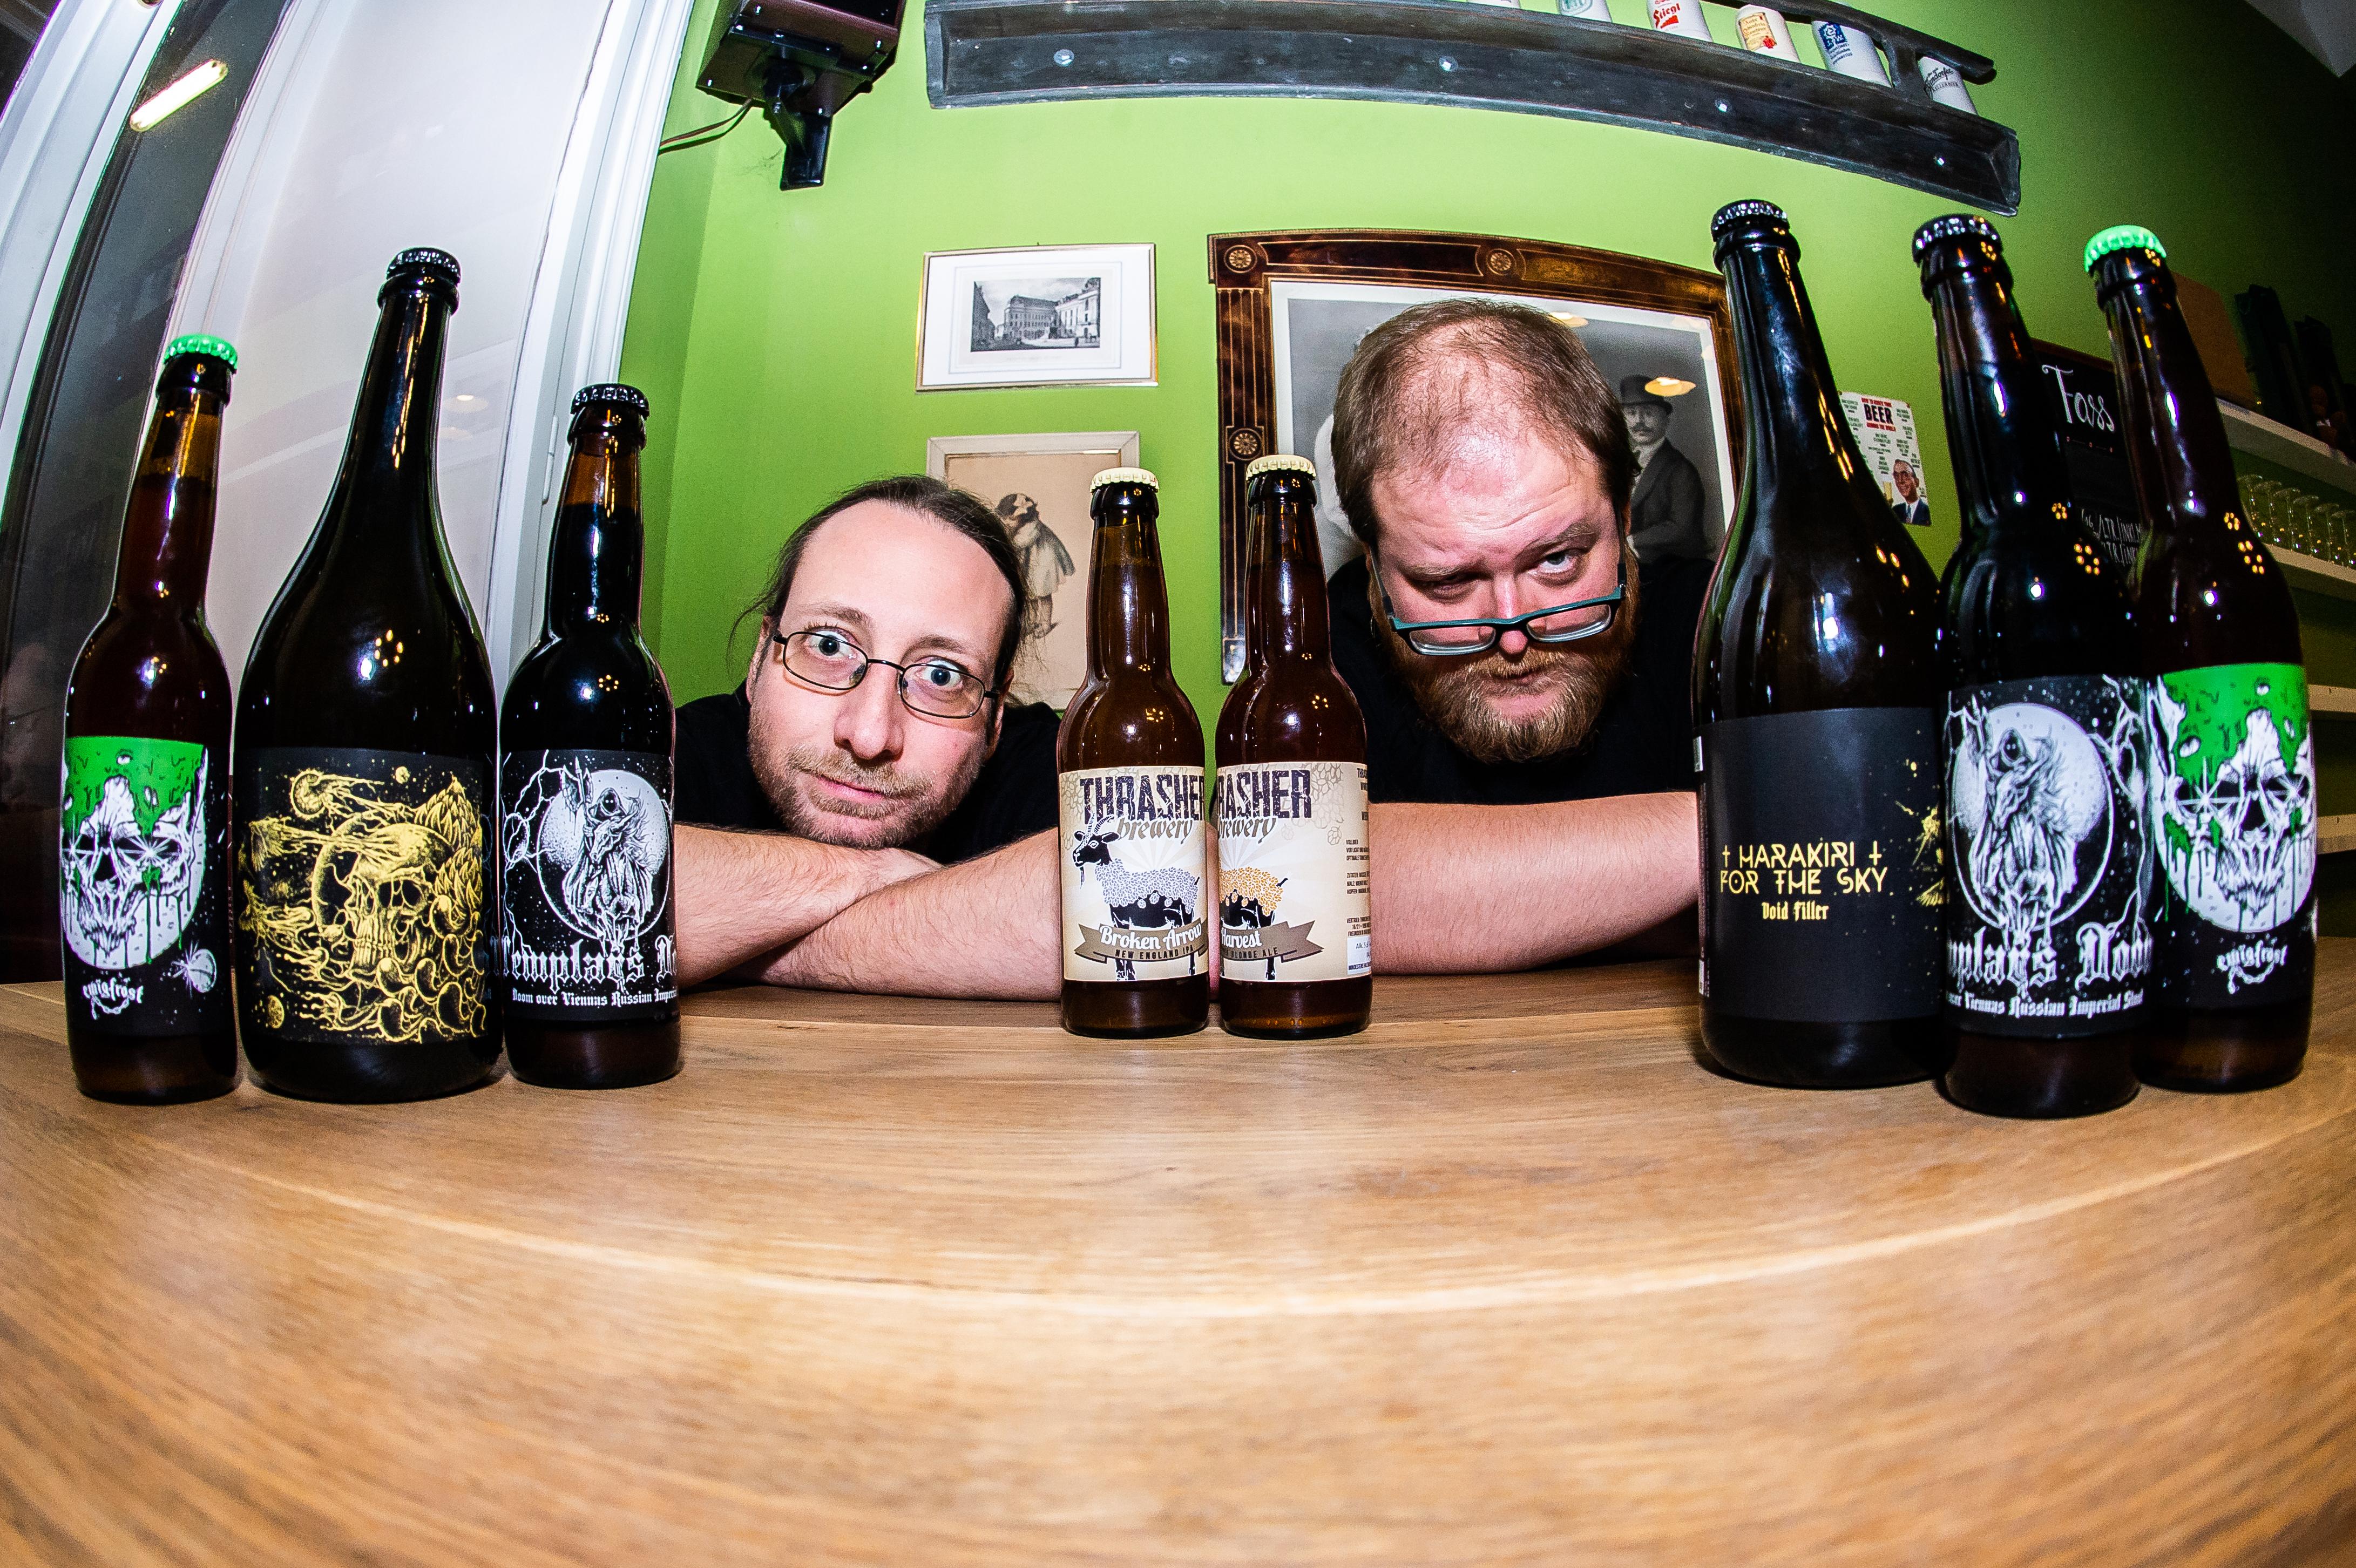 Thrasher Brewery